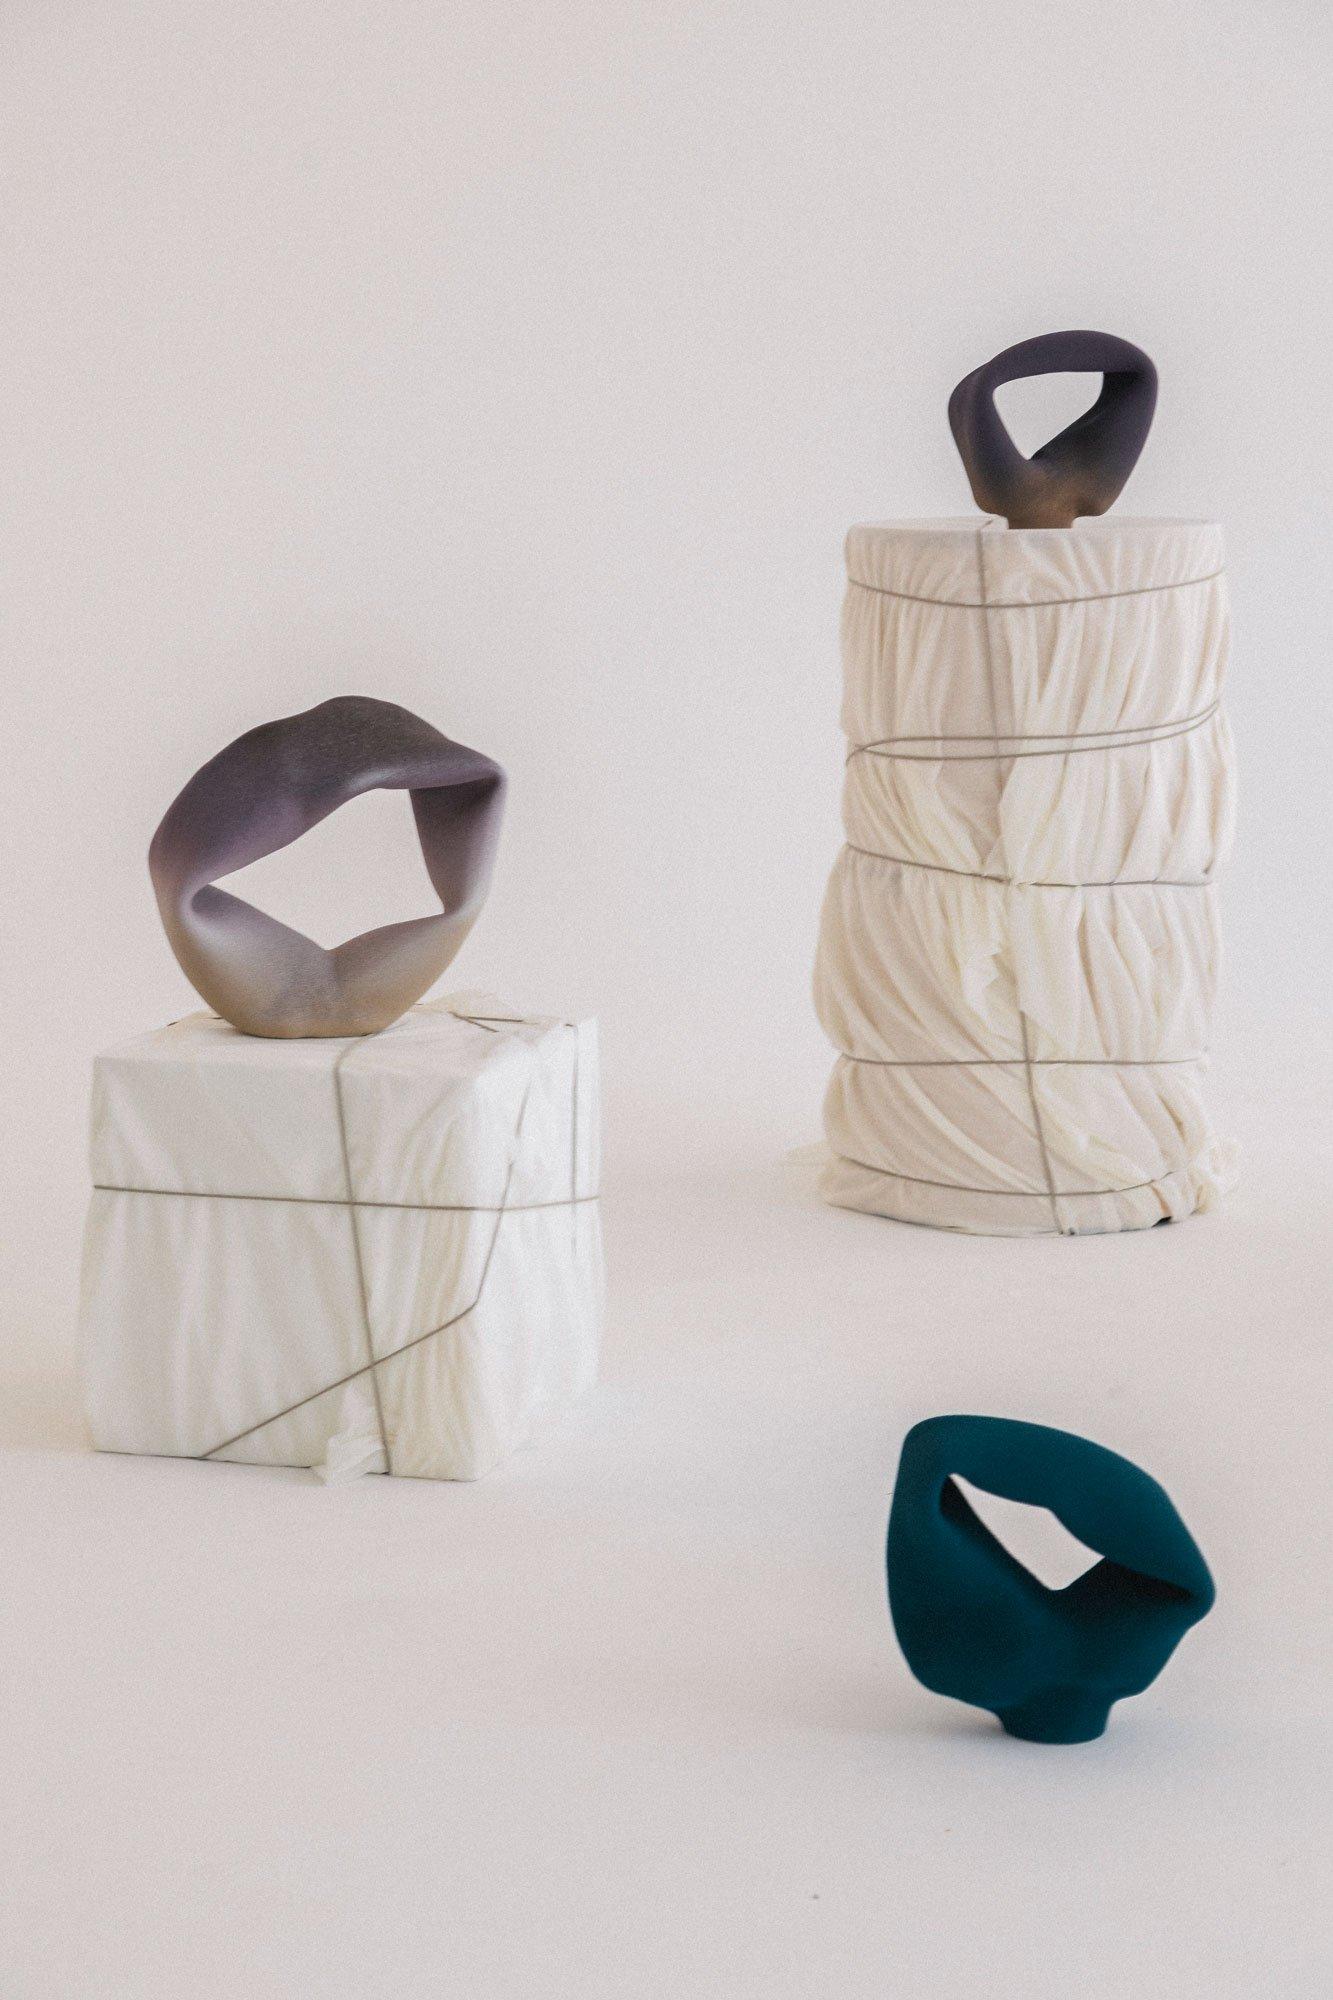 Ukurant Objects, 3daysofdesign 2020, jeunes designers, Esben Kaldahl